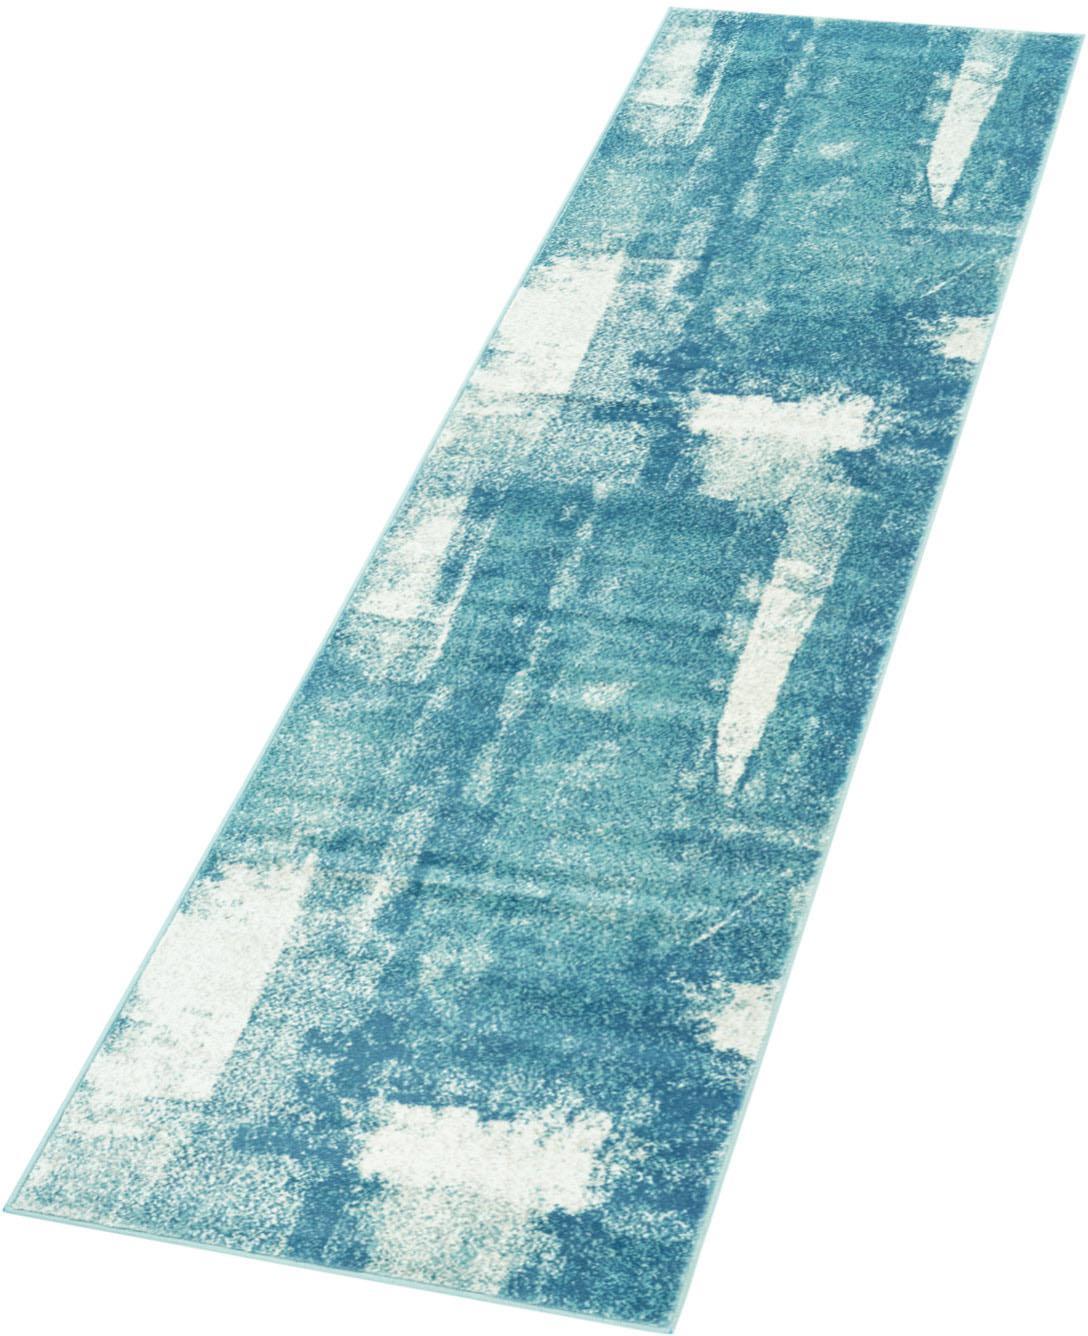 Läufer Inspiration 5784 Carpet City rechteckig Höhe 11 mm maschinell zusammengesetzt